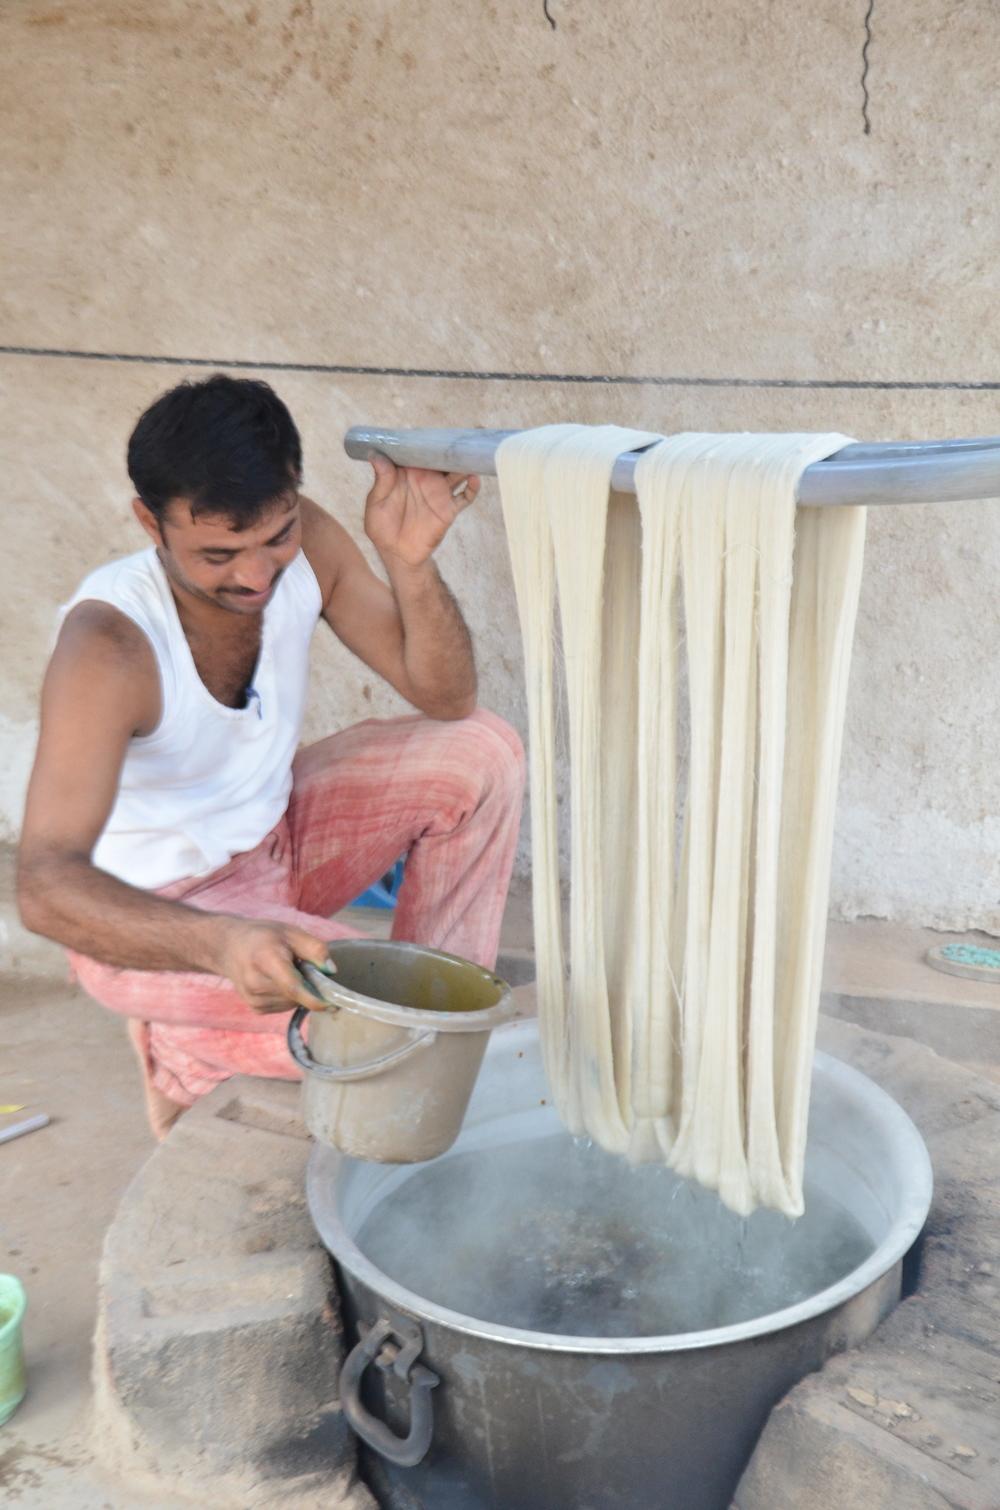 Dinesh Bhai prepares to dye some yarn